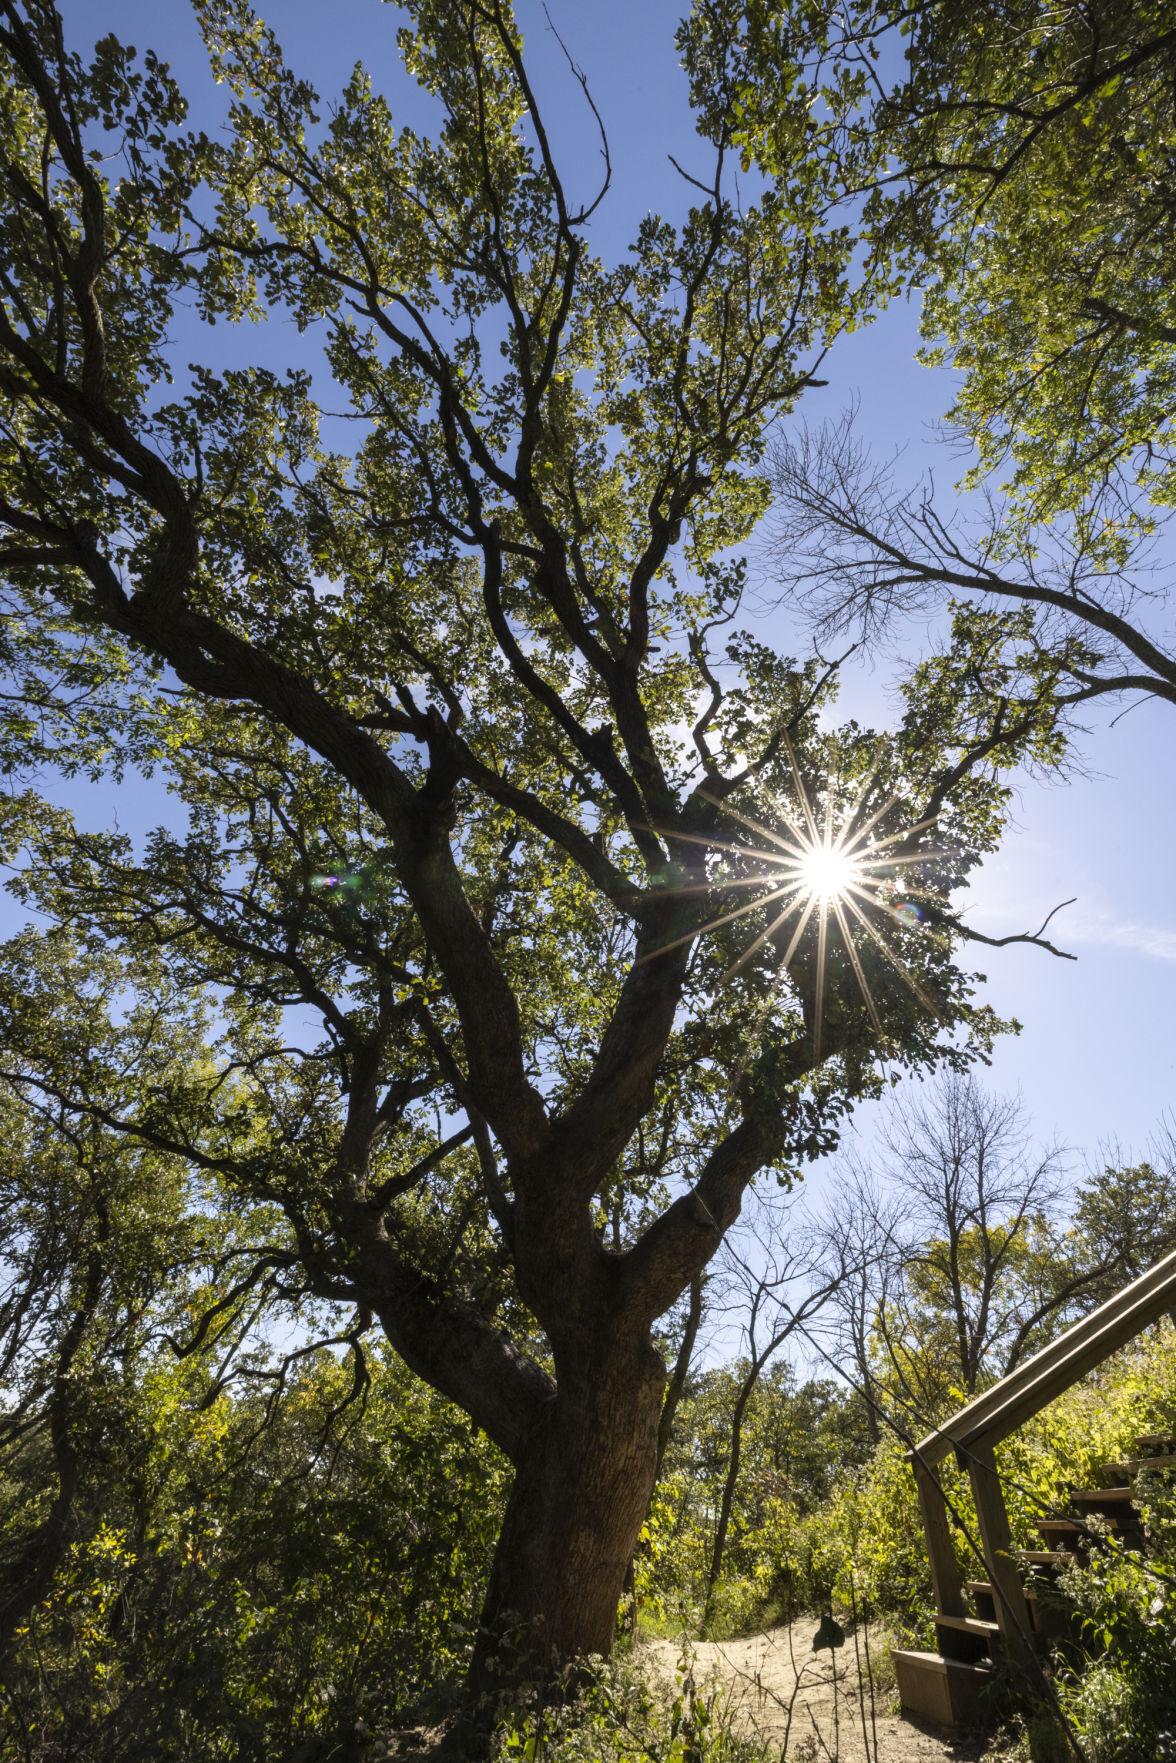 Old oak tree in Ponca State Park